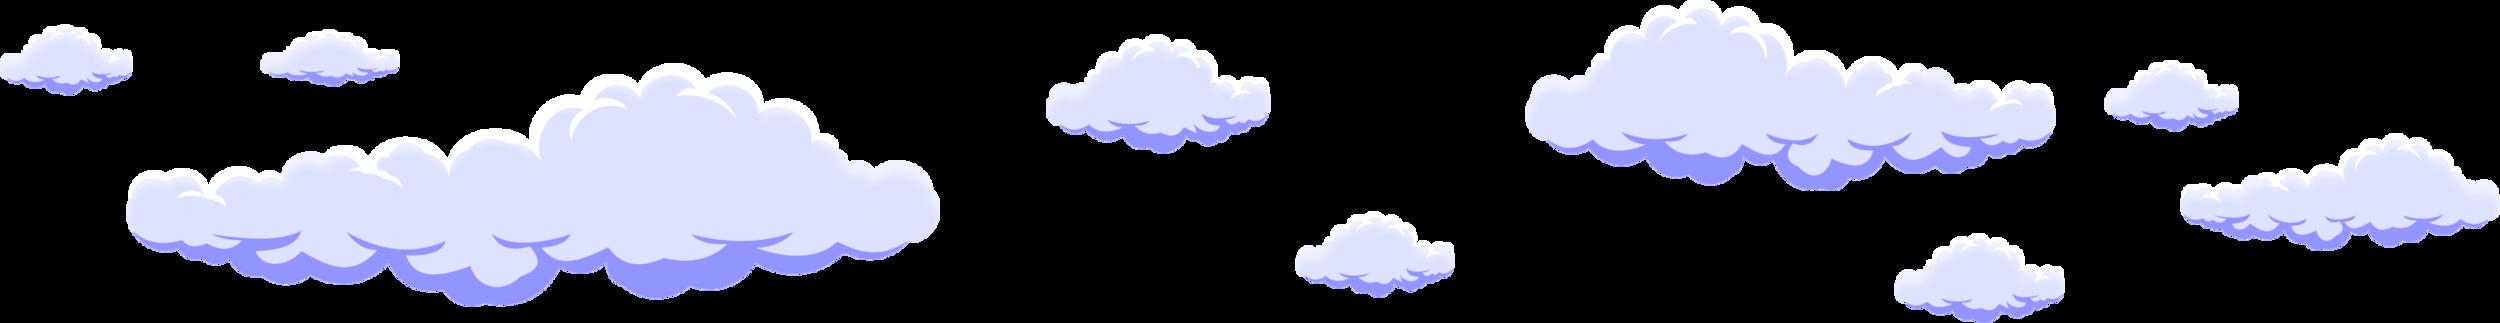 cartoon-clouds-wide.png